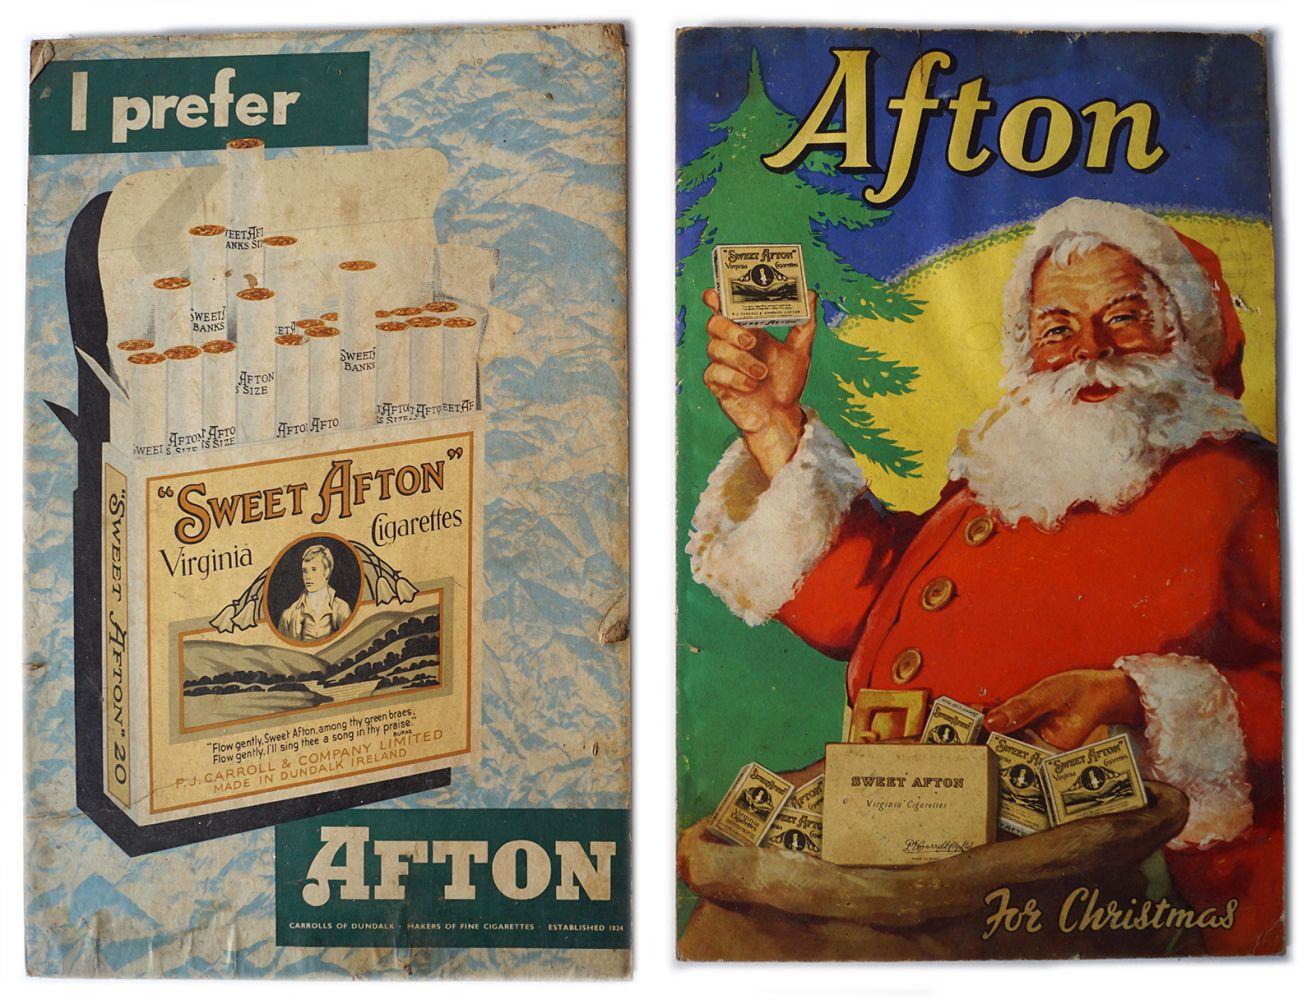 2 AFTON FOR CHRISTMAS ORIGINAL POSTERS